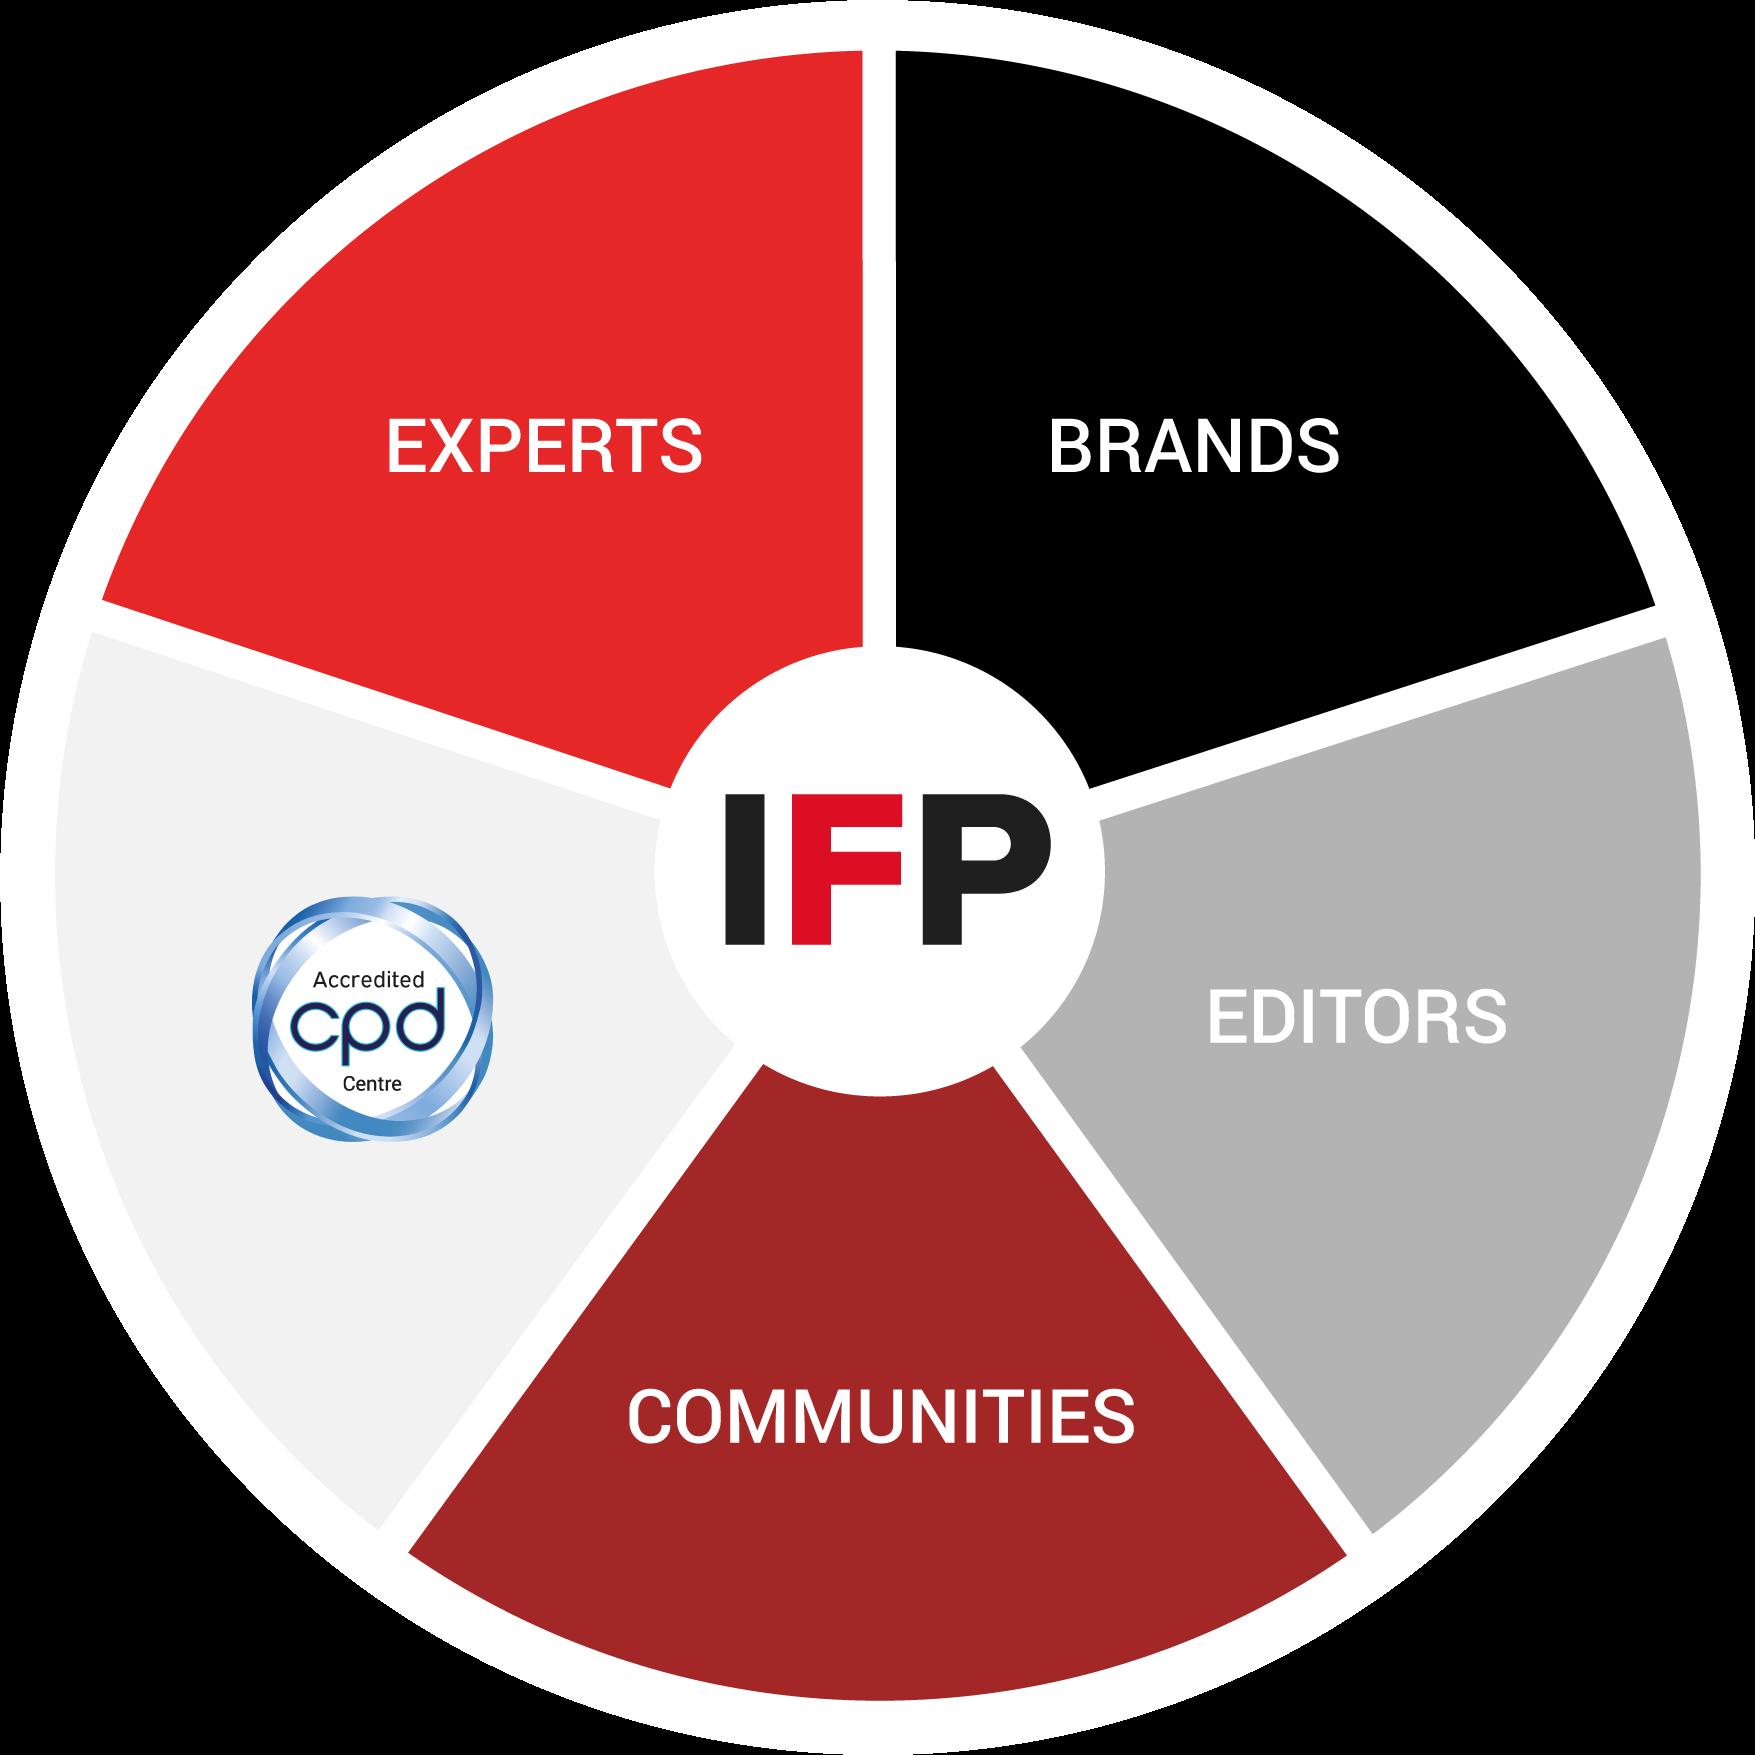 Breakdown of IFP